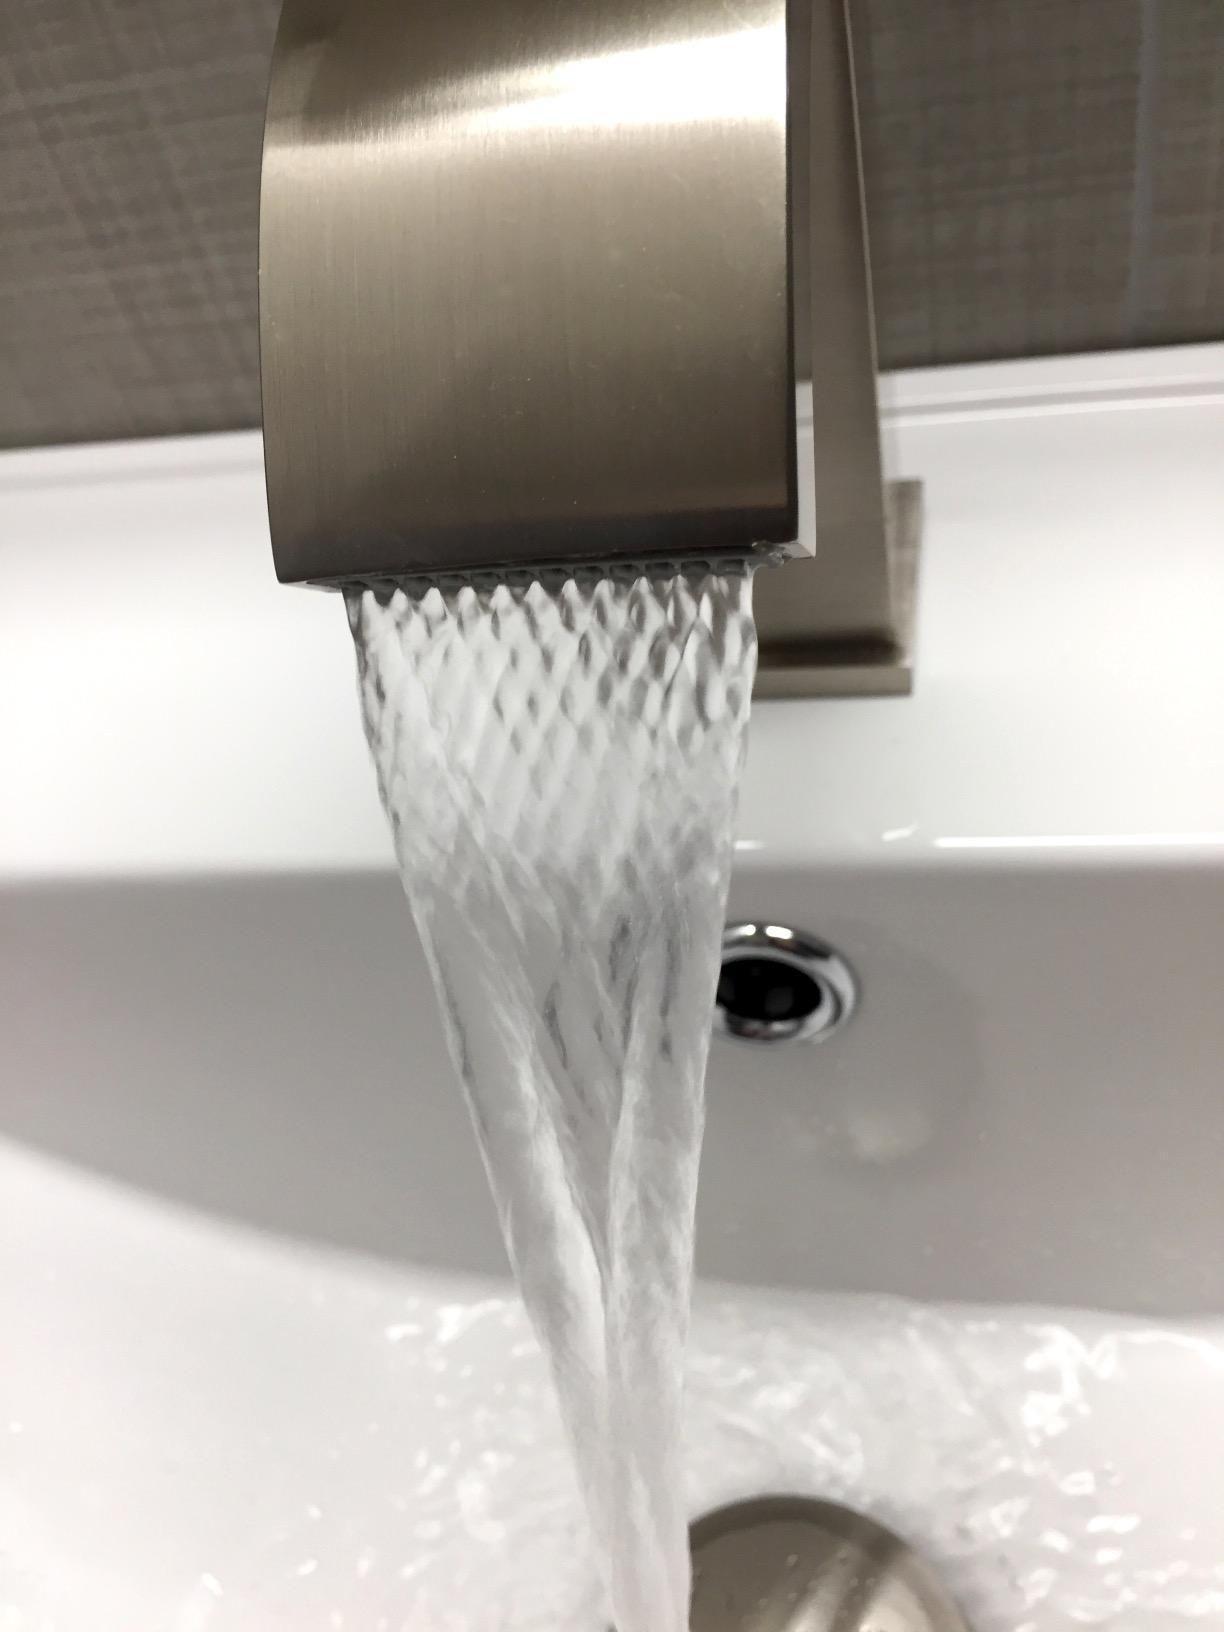 Best Bathroom Faucet Reviews In 2020 Best Bathroom Faucets